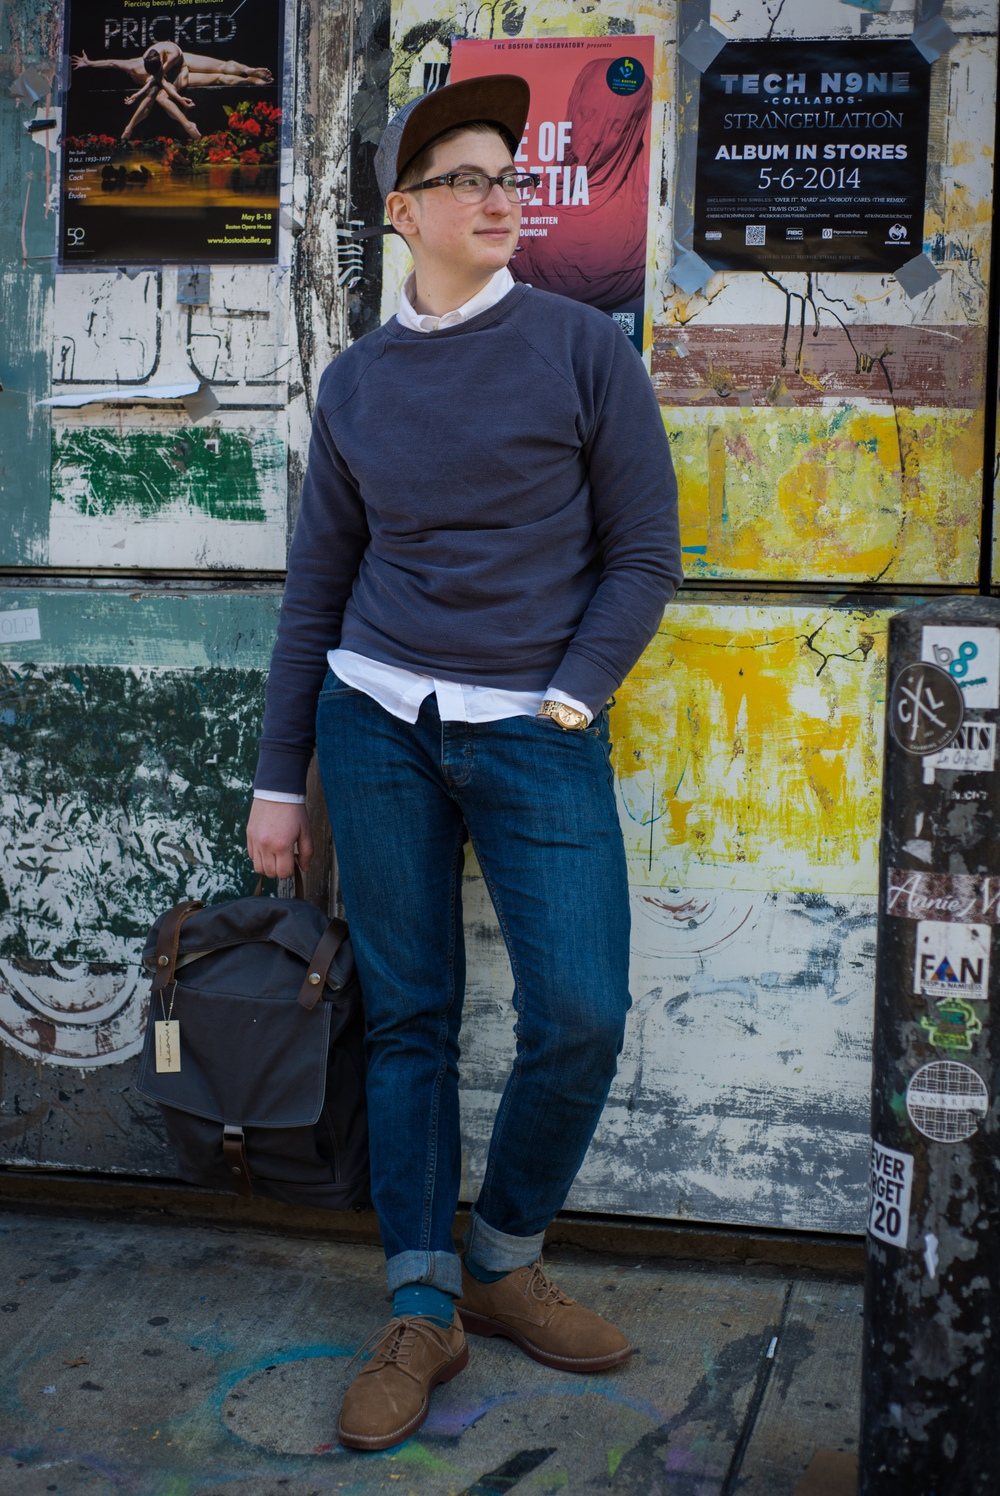 Sonny Oram Dapper Streetwear with Everlane, Brixton, Moop